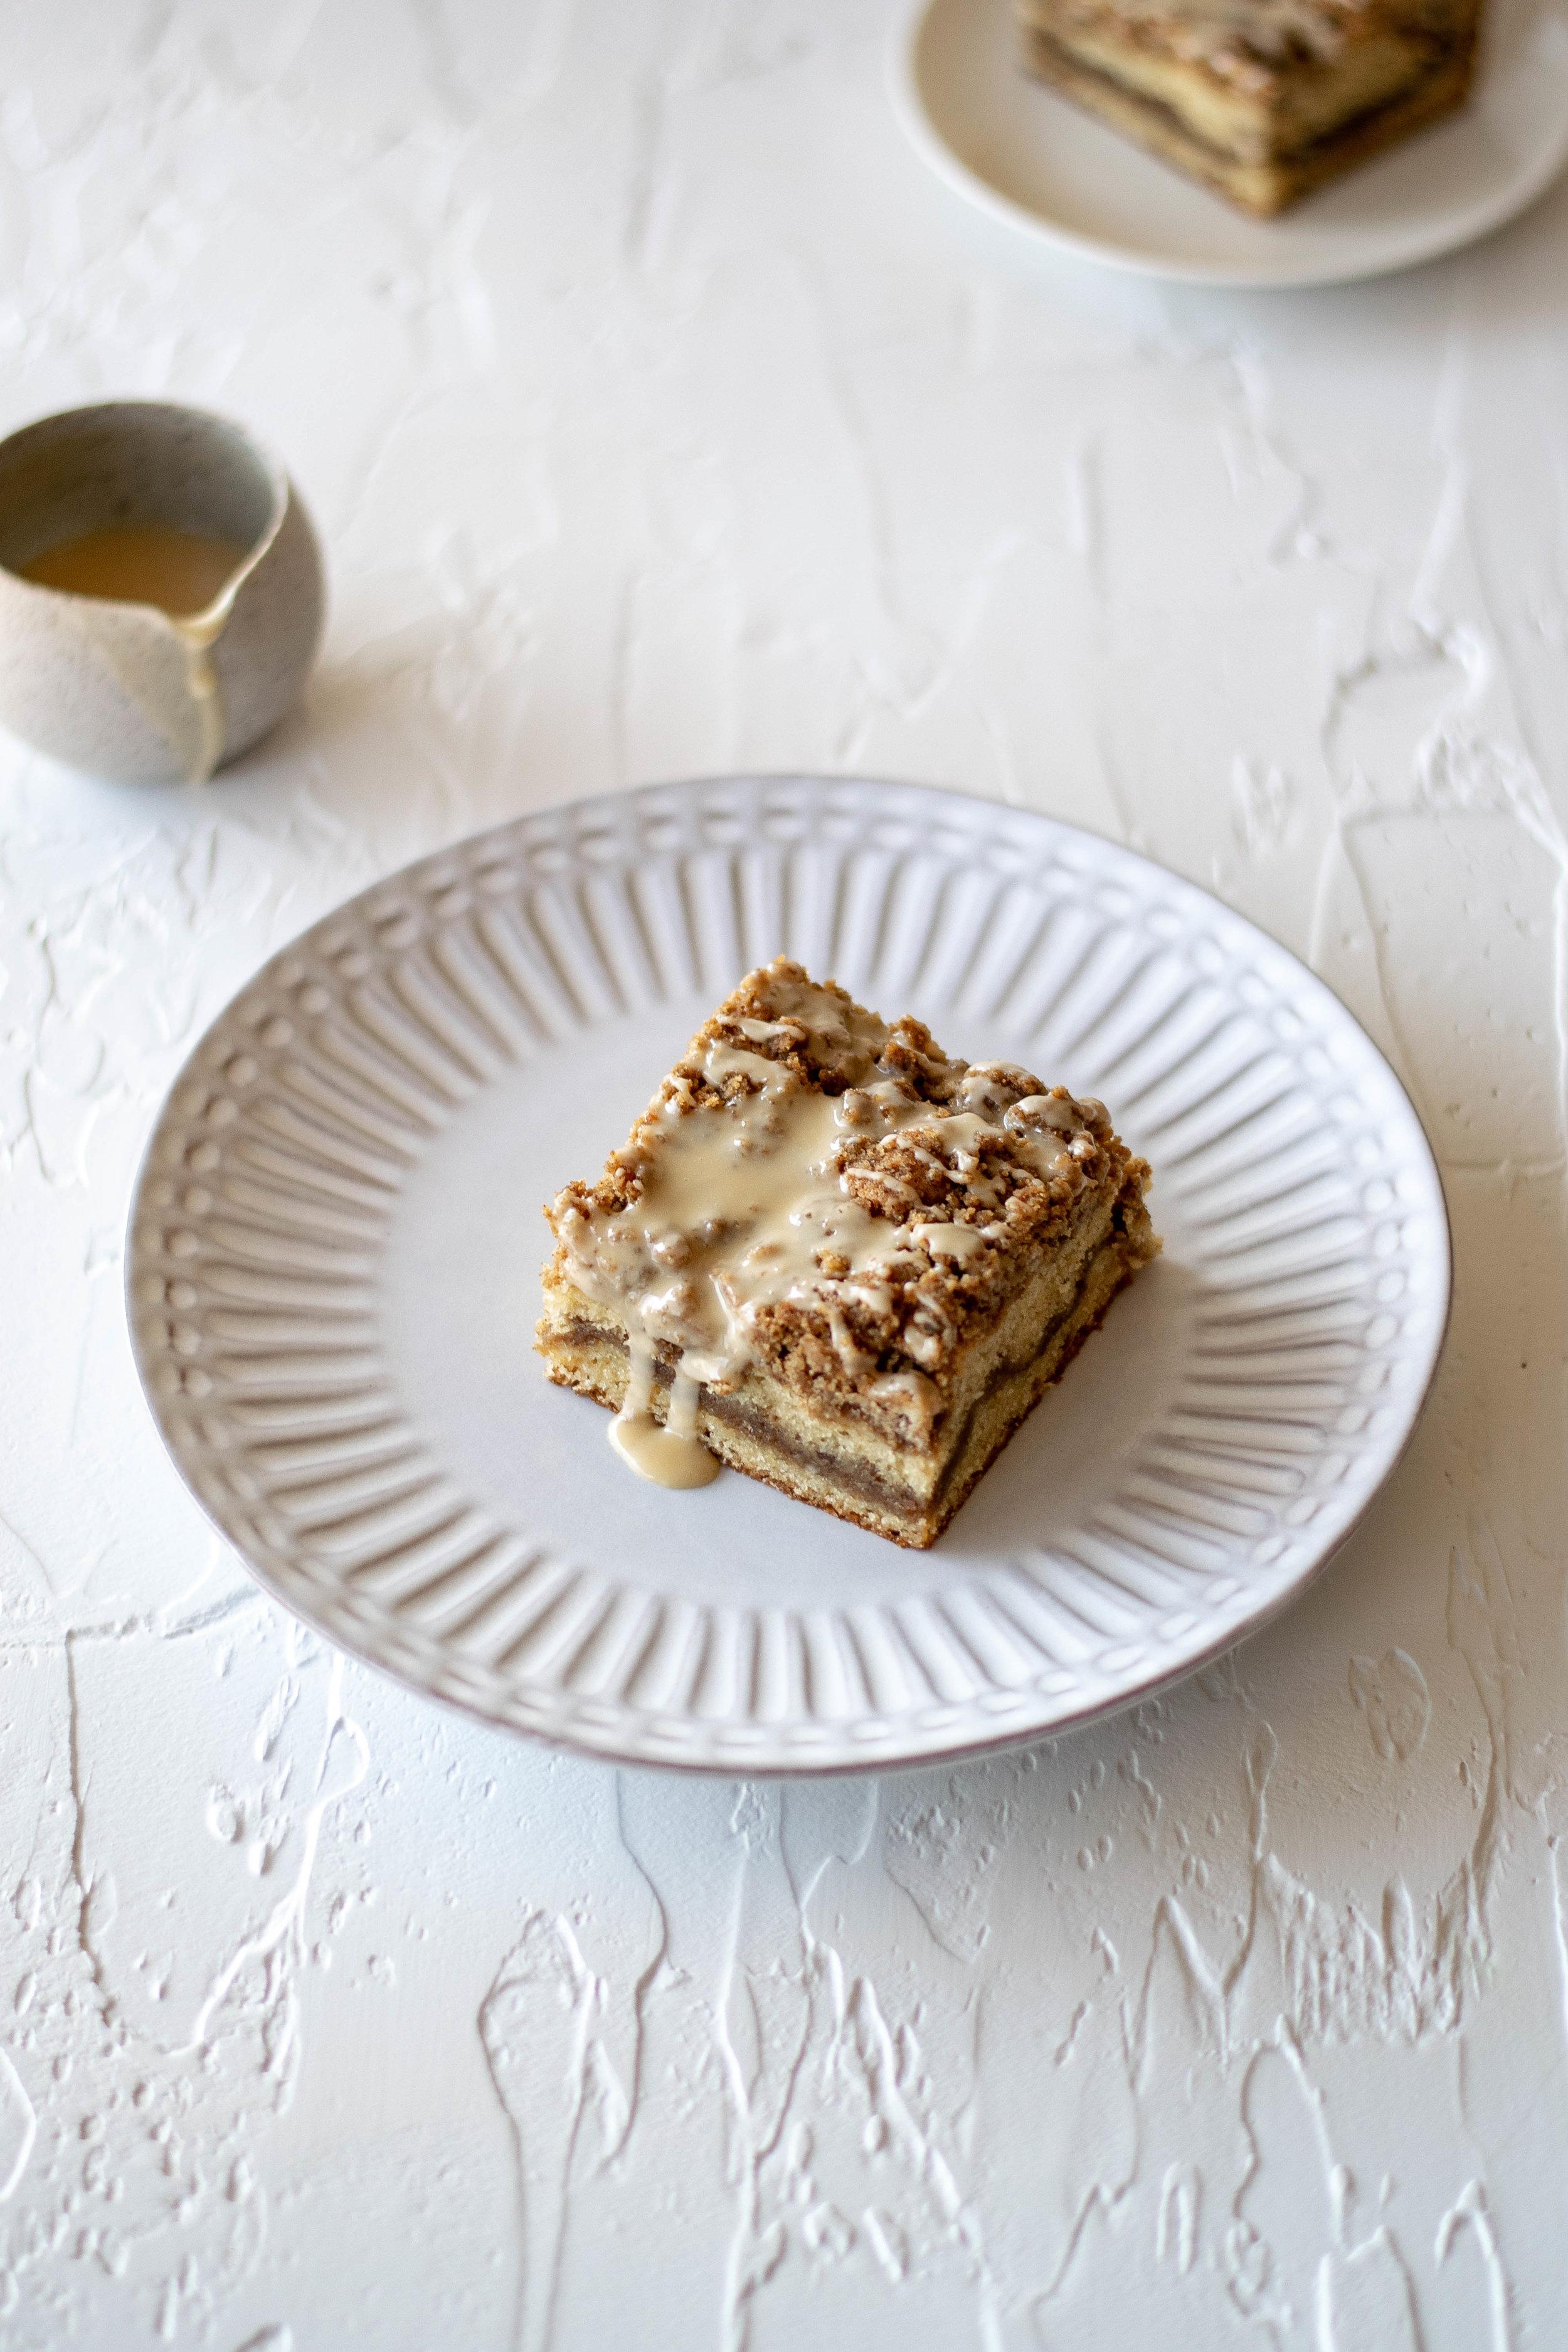 Irish Cream Coffee Cake with Espresso Crumb Topping | All Purpose Flour Child